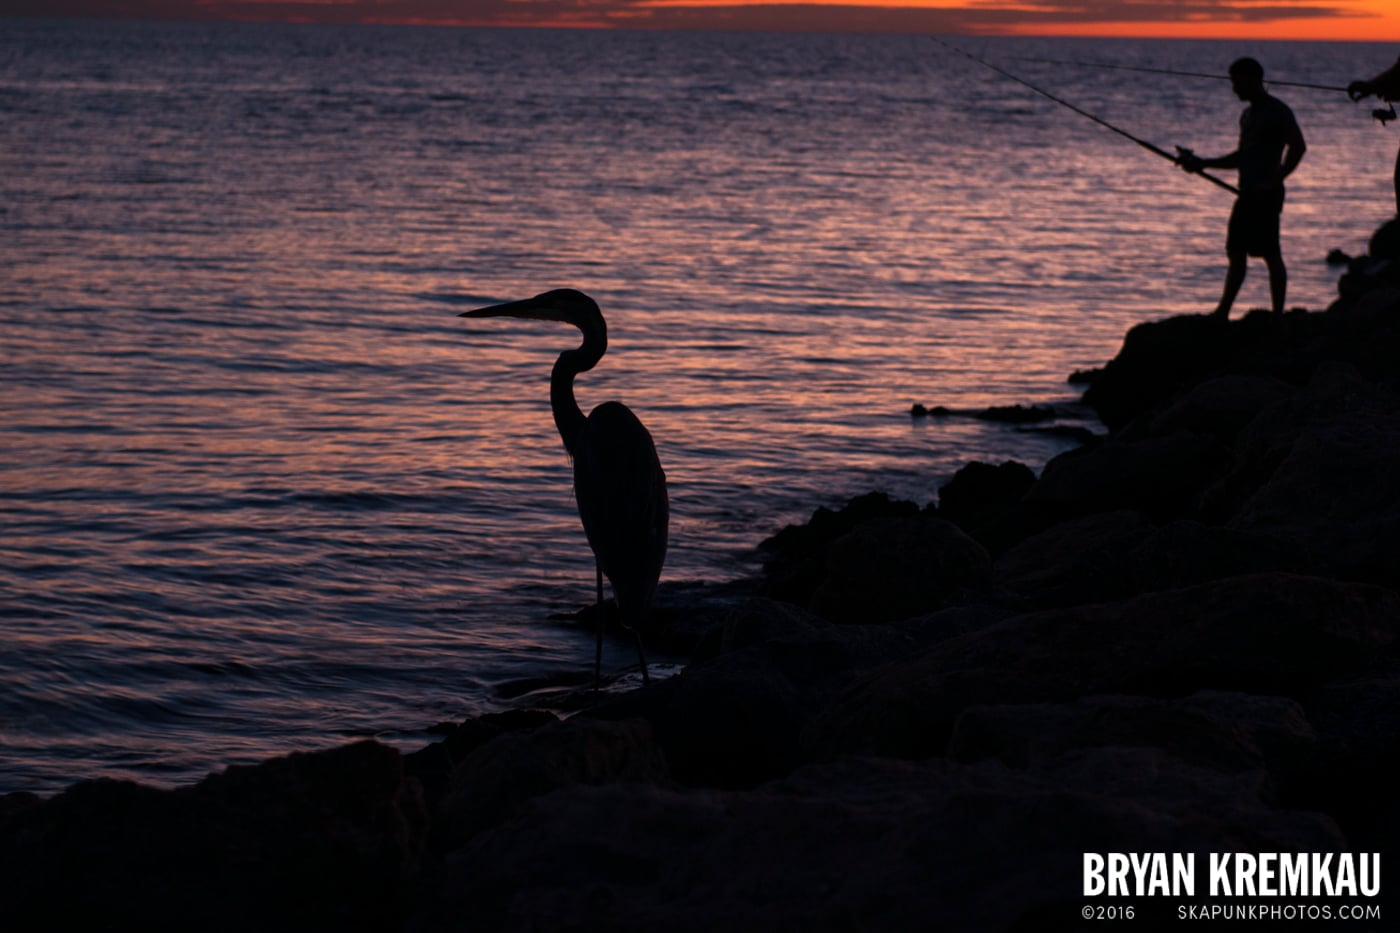 Sunsets, Astrophotography & Birds @ Venice, Florida - 10.25.14 - 11.5.14 (122)